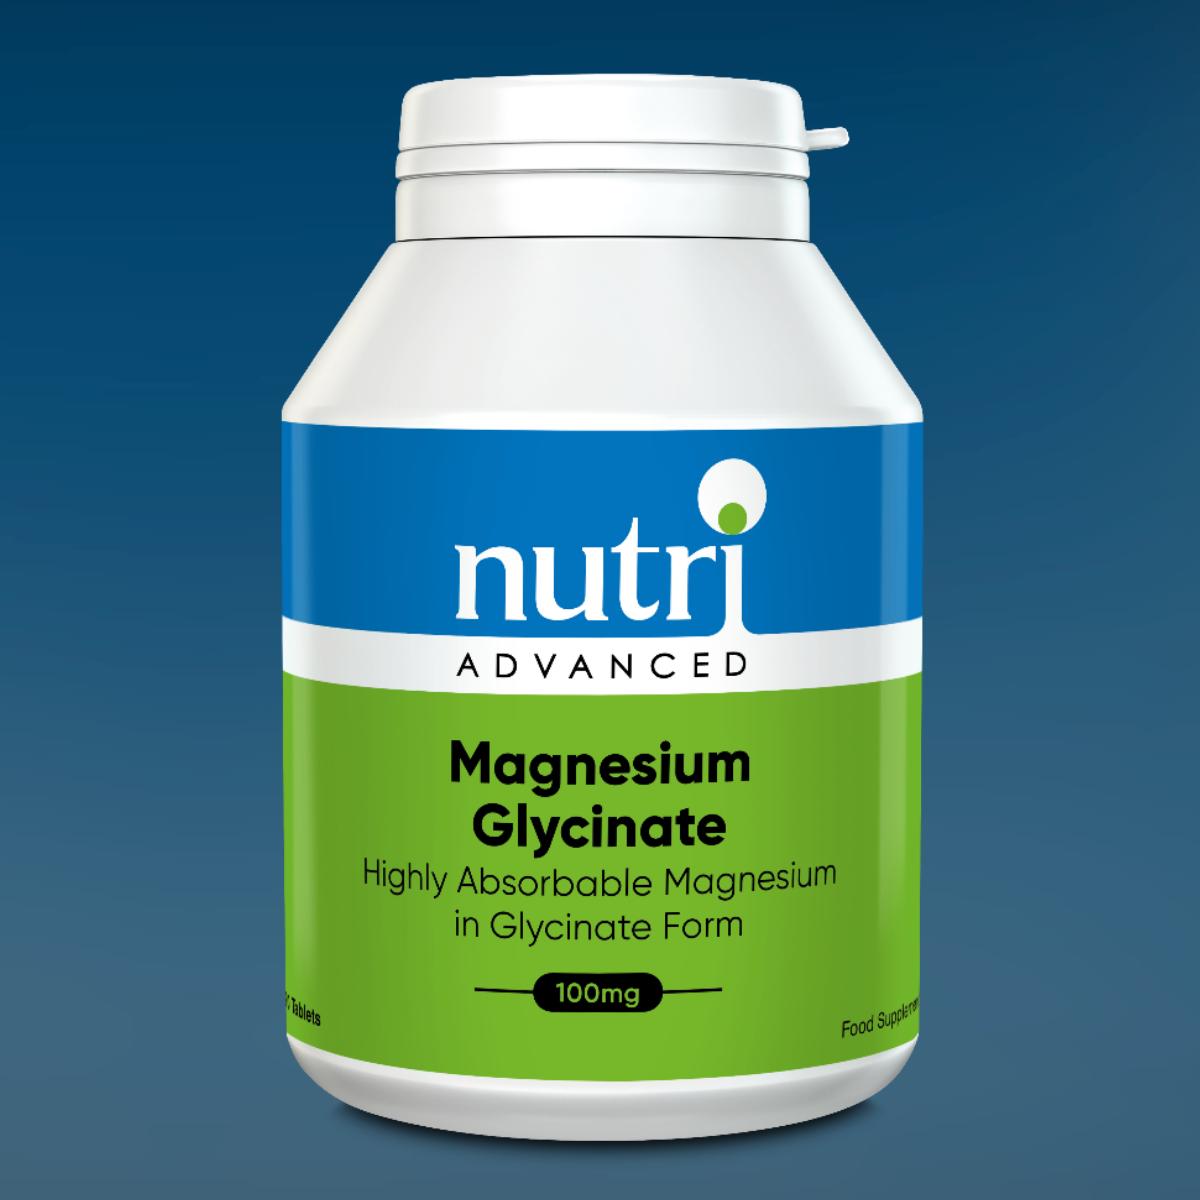 Nutri Advanced High Strength Magnesium Glycinate Tablets Nutri Advanced Favourites